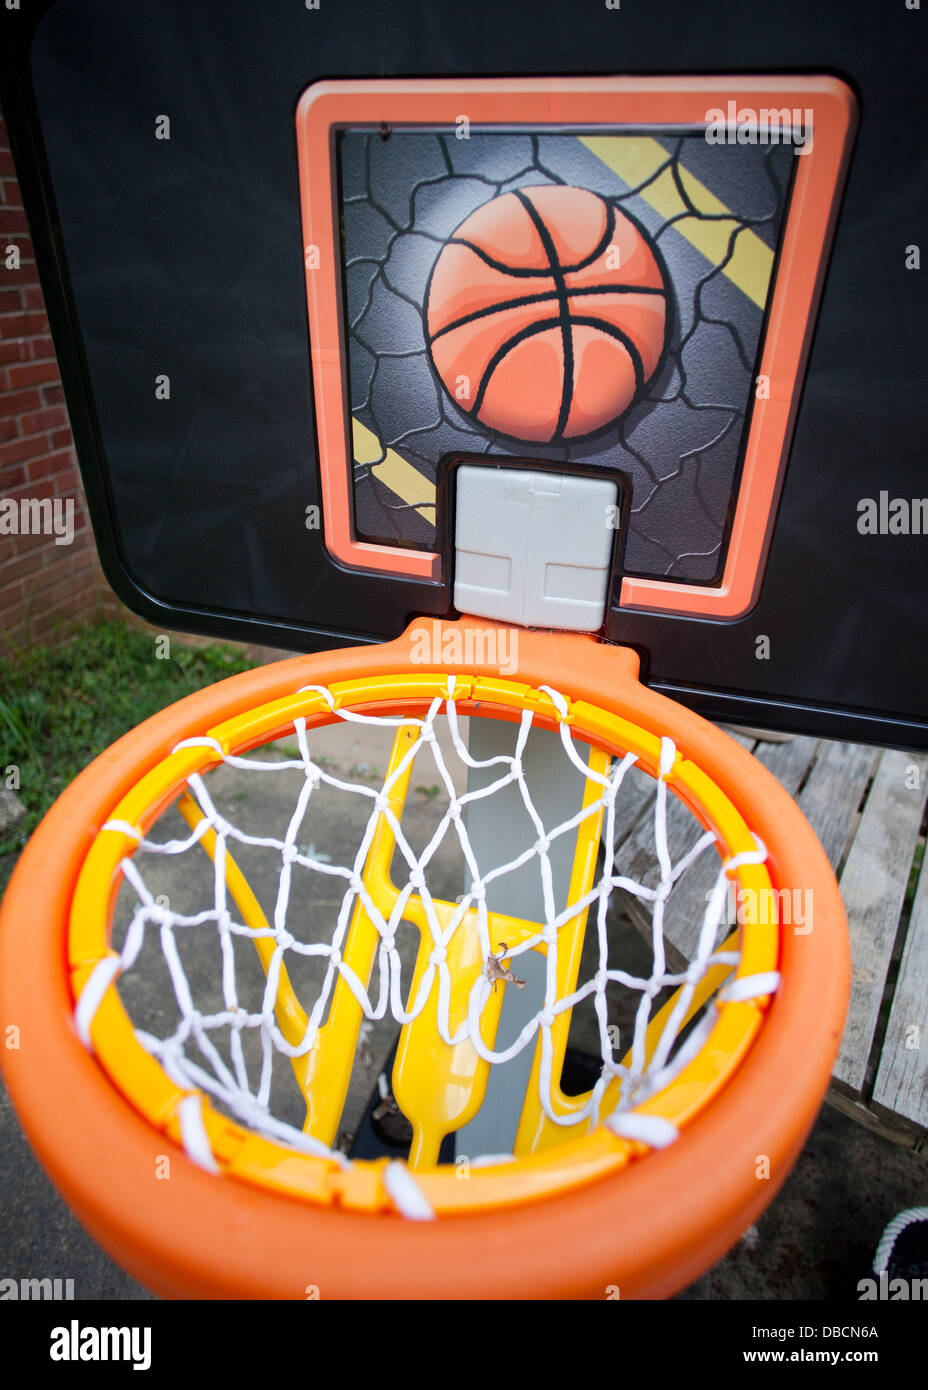 Child's basketball hoop - Stock Image